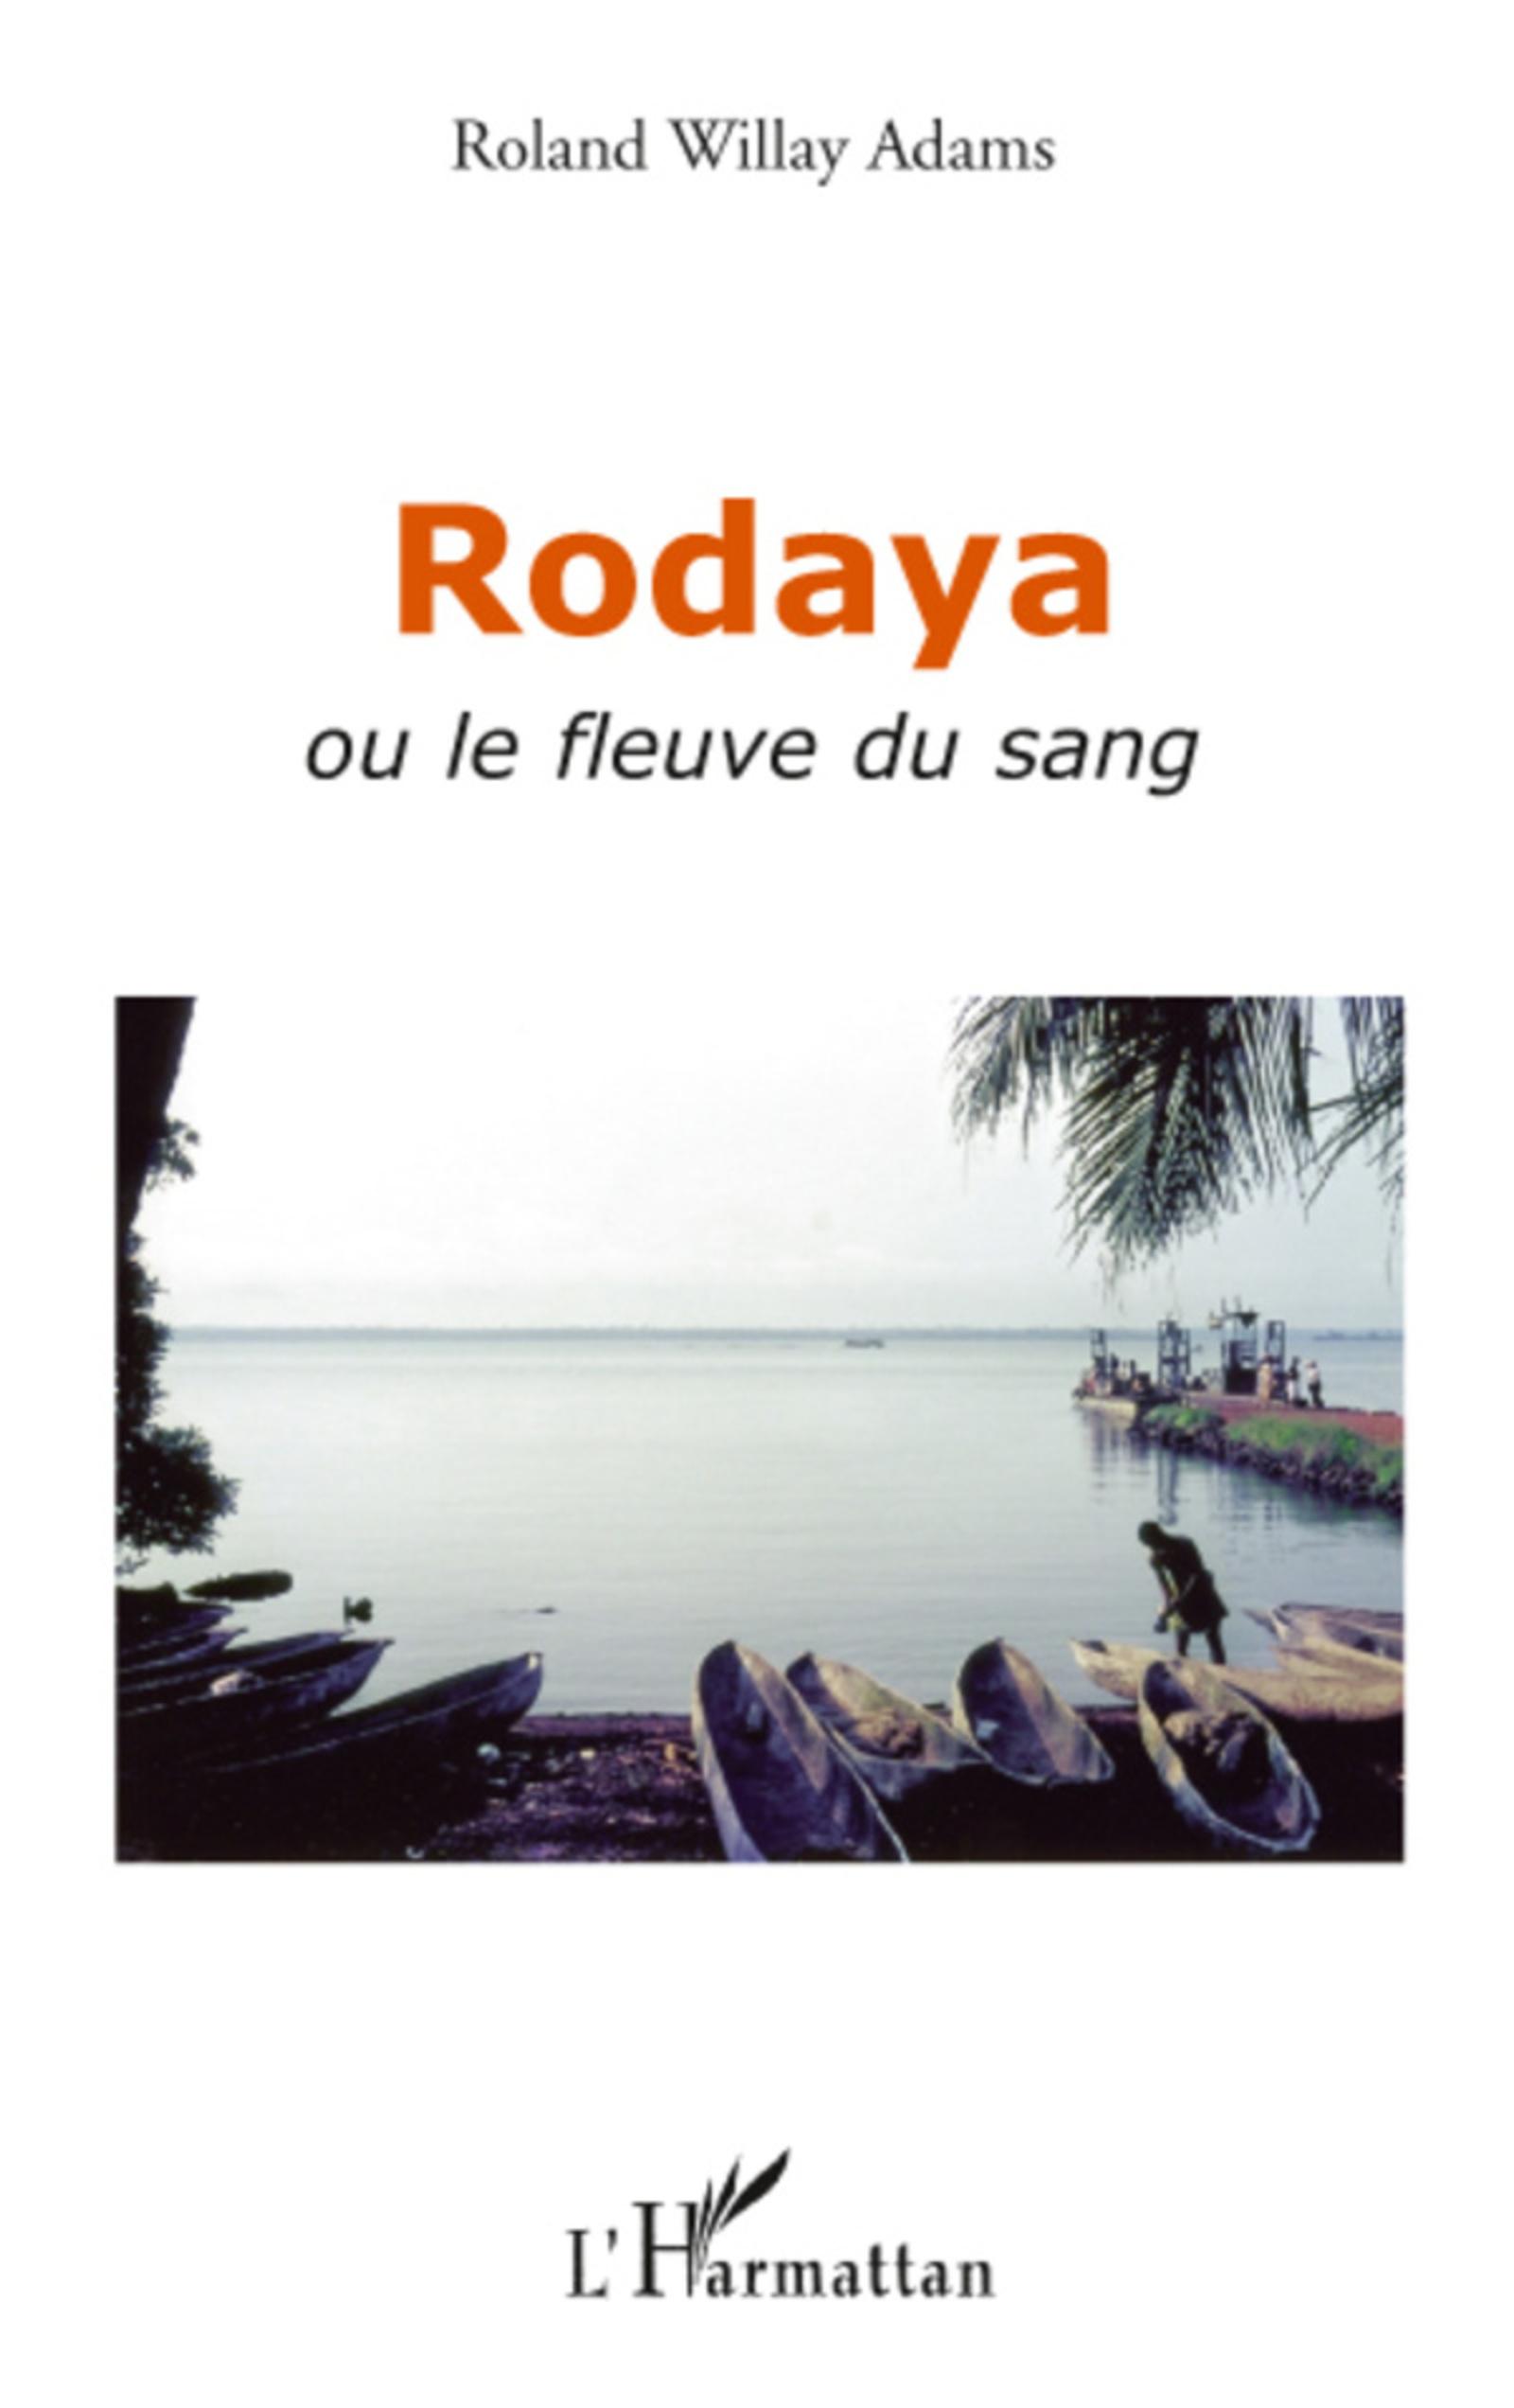 Rodaya ou le fleuve du sang